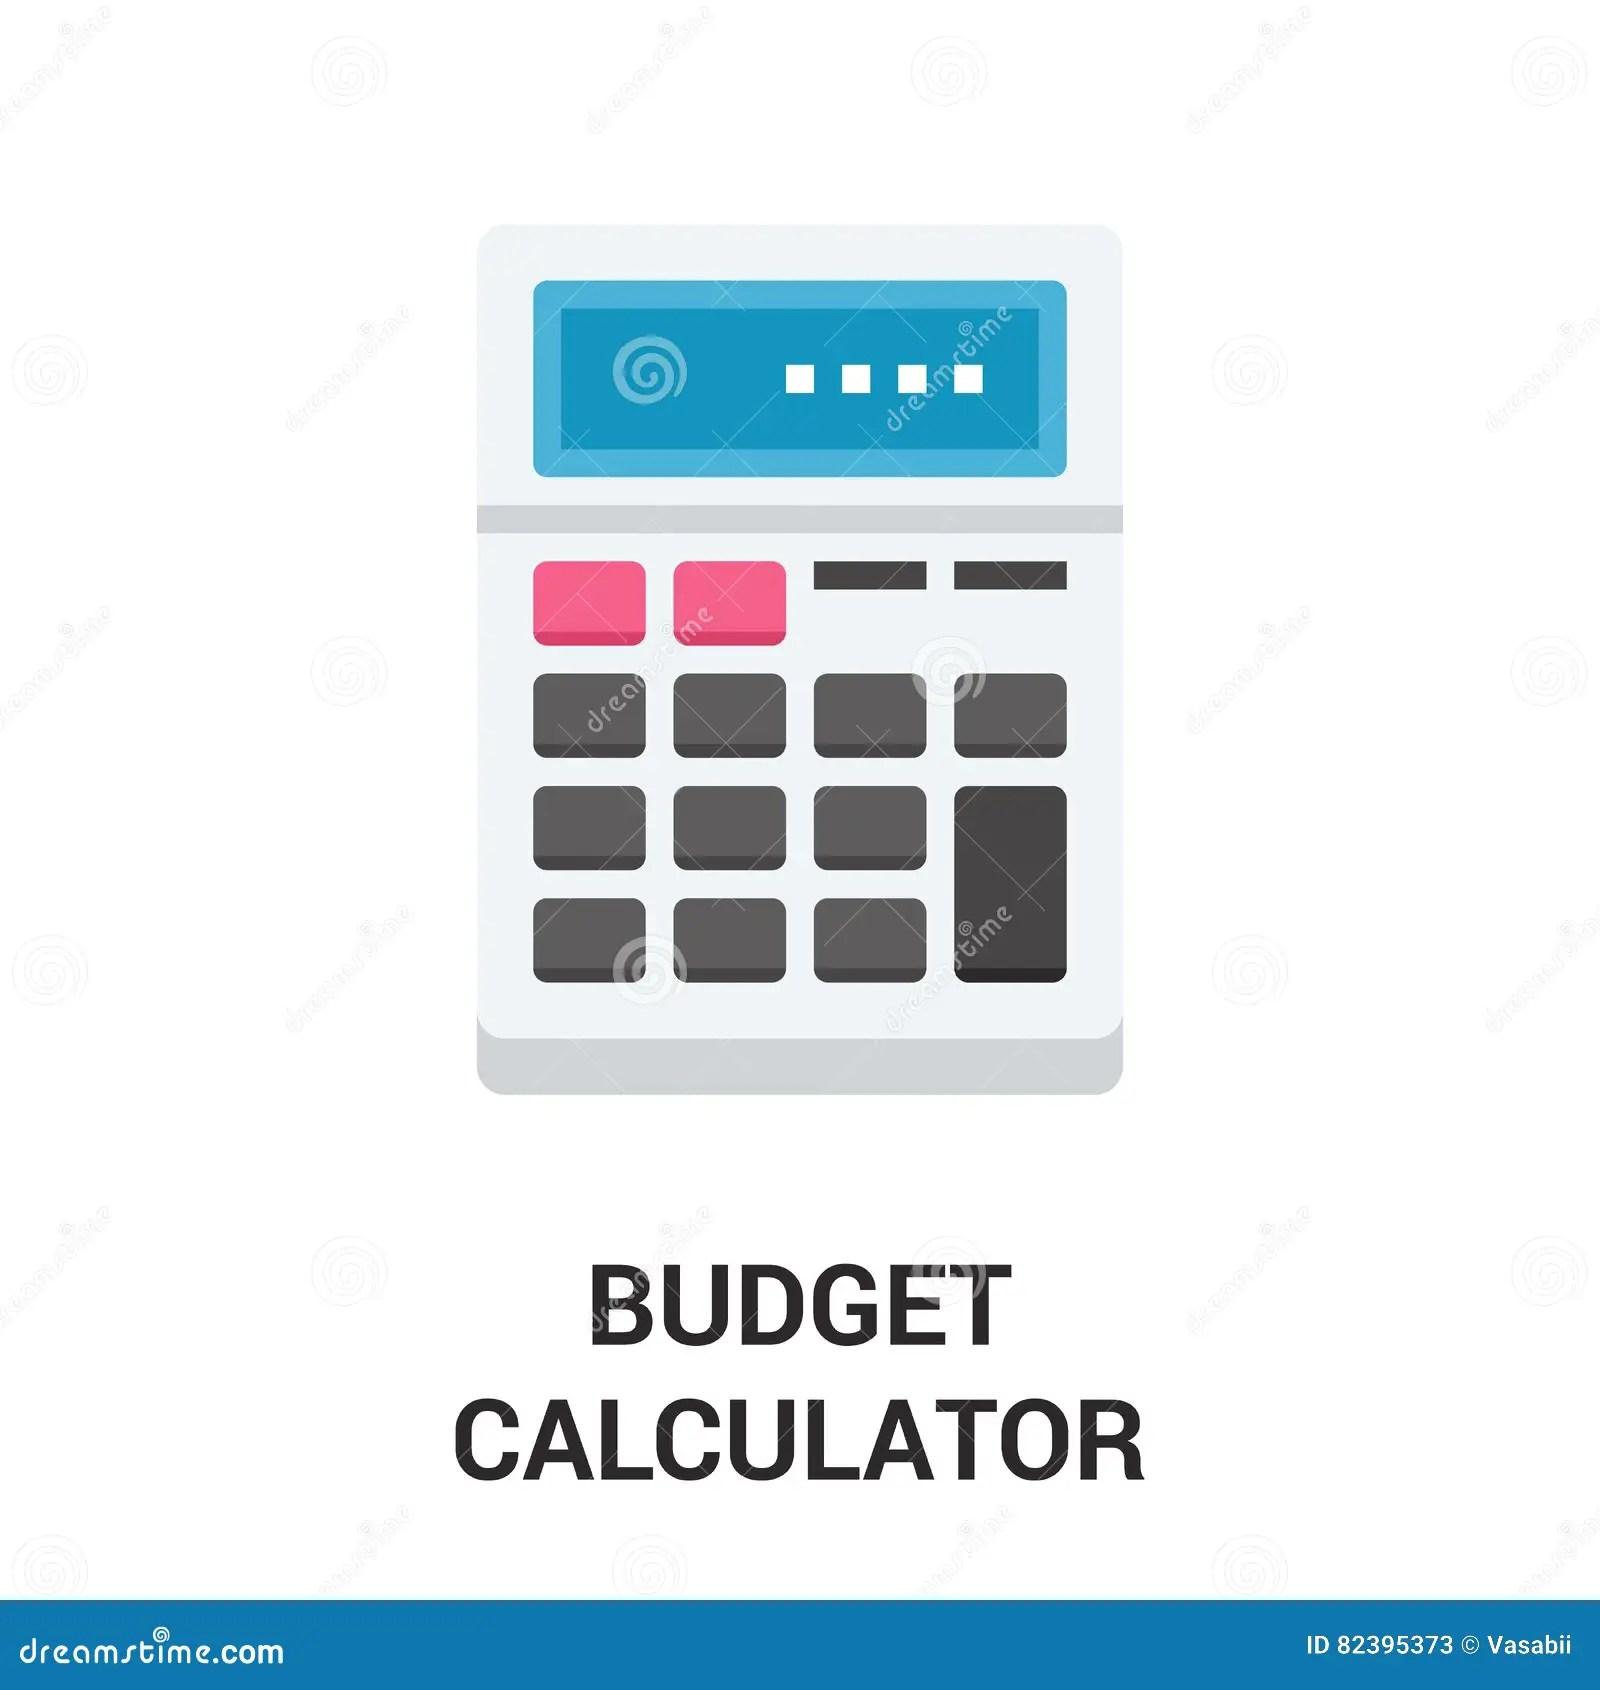 Budget Calculator Icon Concept Stock Image